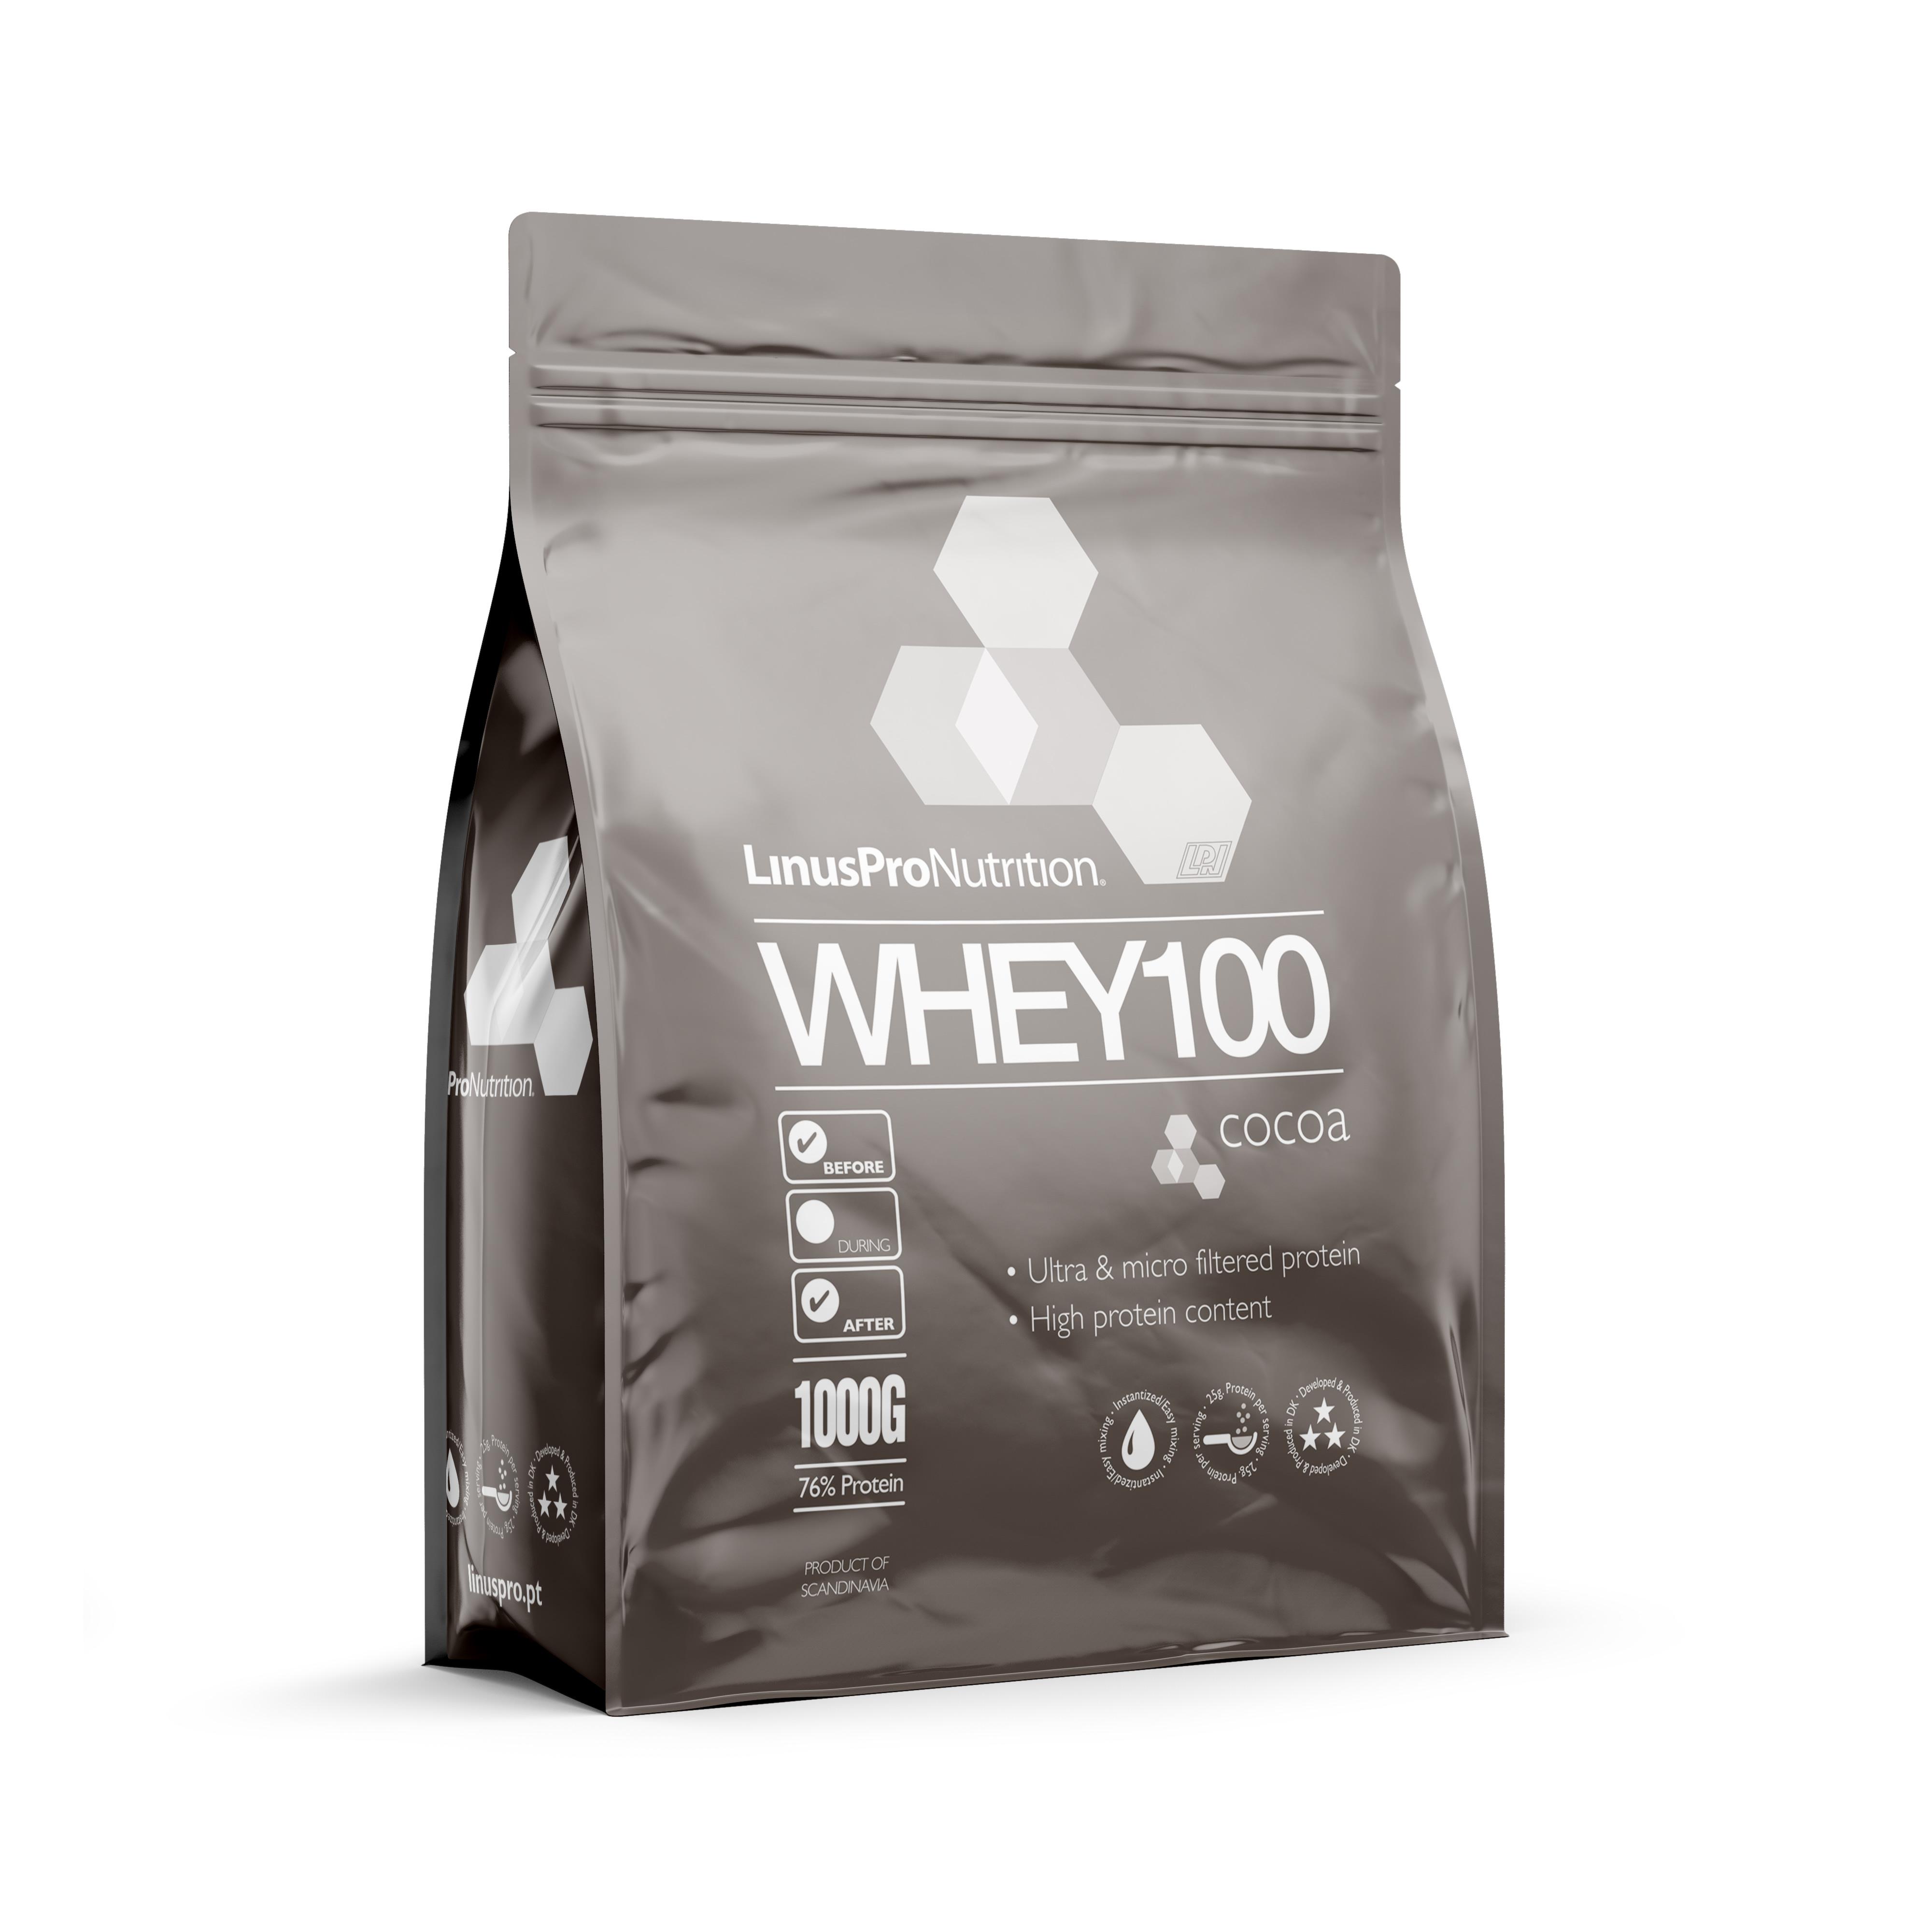 Image of LinusPro WHEY100 Proteinpulver (Chokolade, 1000 g)